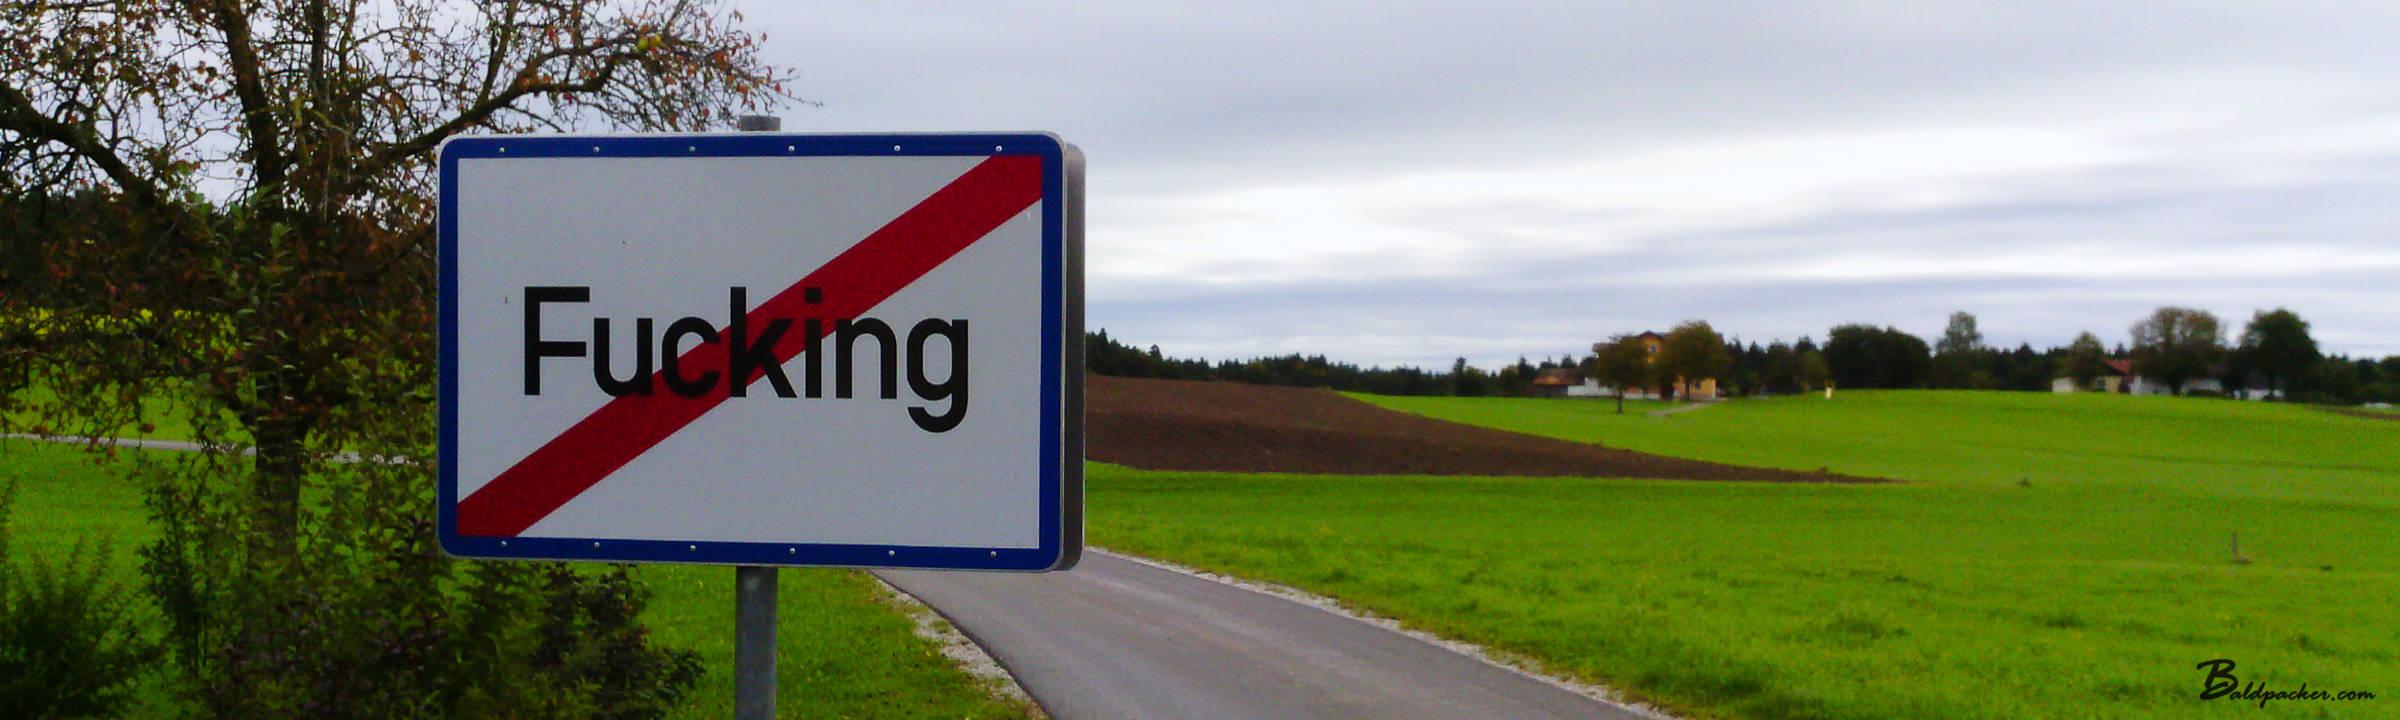 Road Trip to Fucking, Austria – No, Really, the Town of Fucking in Austria